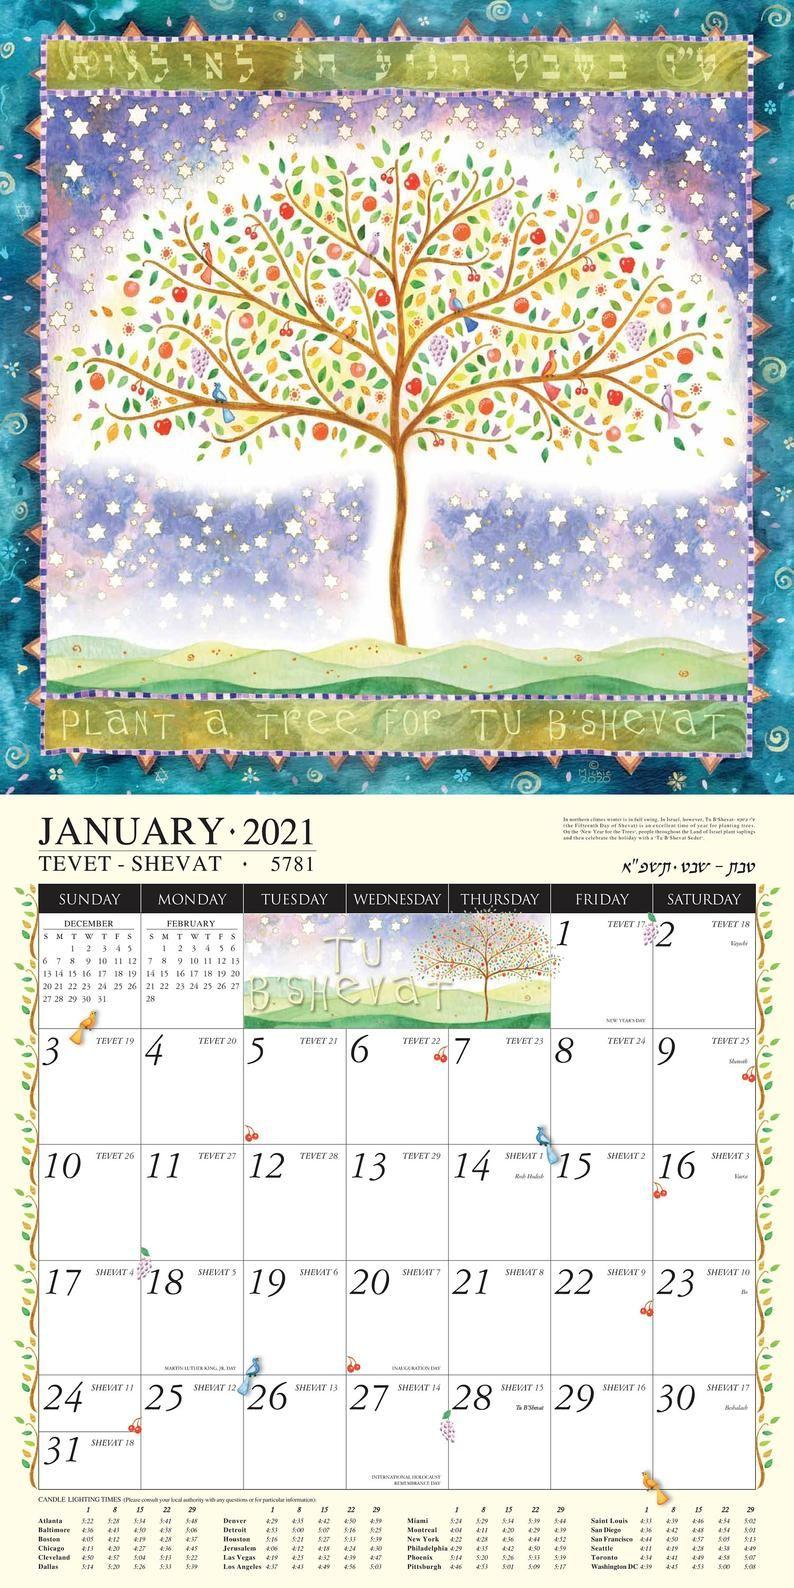 Torah Portion Calendar 2022.Jewish Art Calendar 2022 Mickie Caspi 16 Month Wall Etsy Art Calendar Jewish Holiday Calendar Jewish Art